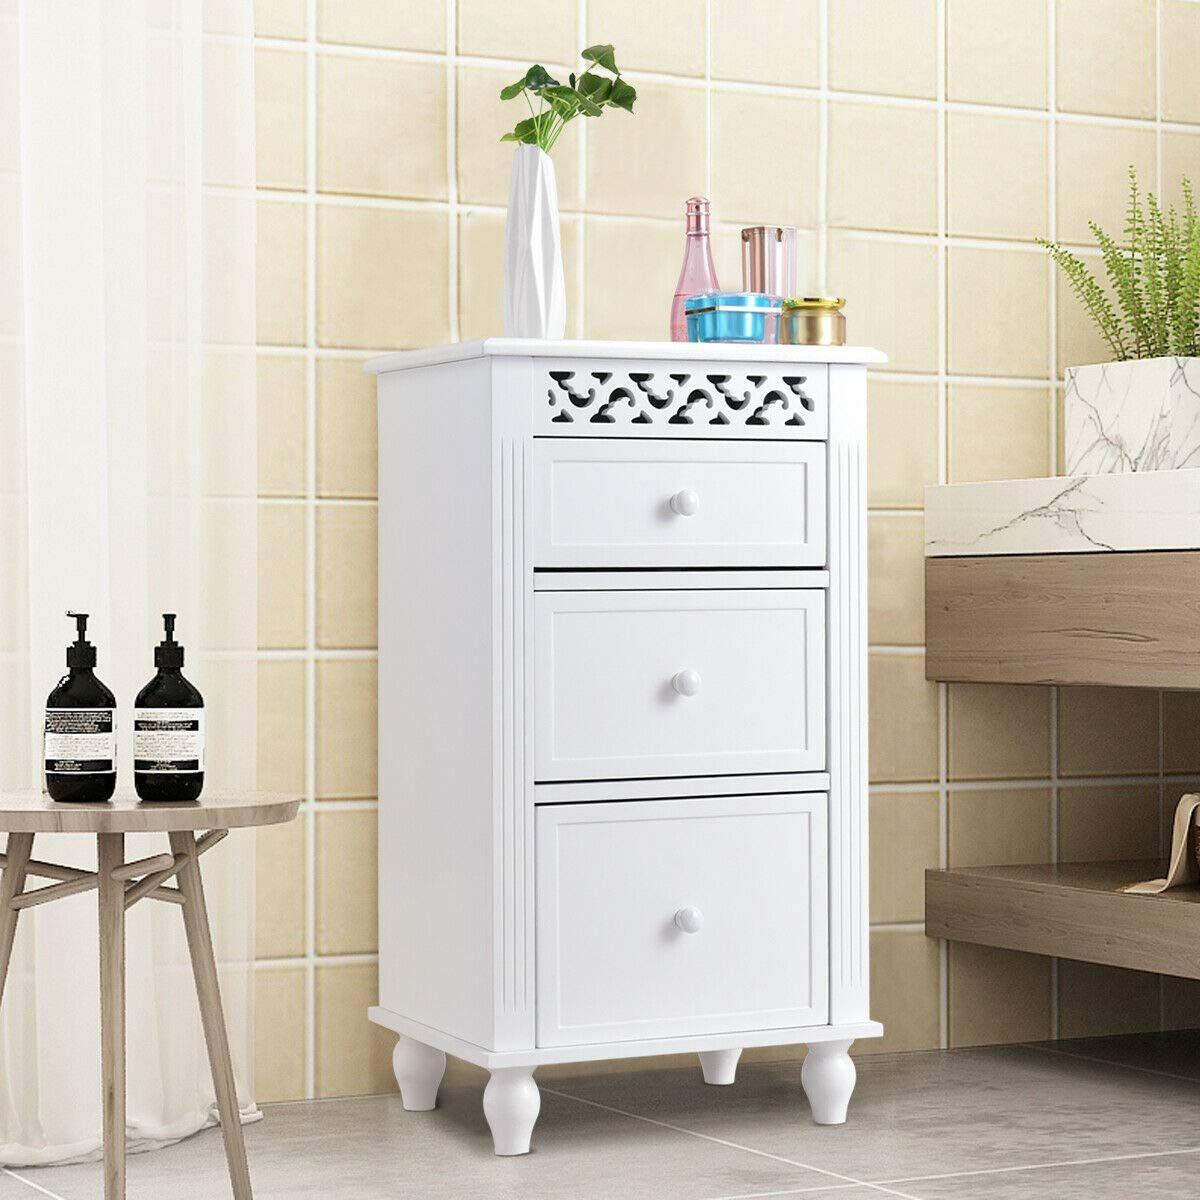 Giantex Storage Floor Cabinet W 3 Drawers Wood Bathroom Cupboard Organizer Kitchen Collection Cab Bathroom Floor Cabinets Cupboards Organization Wood Bathroom